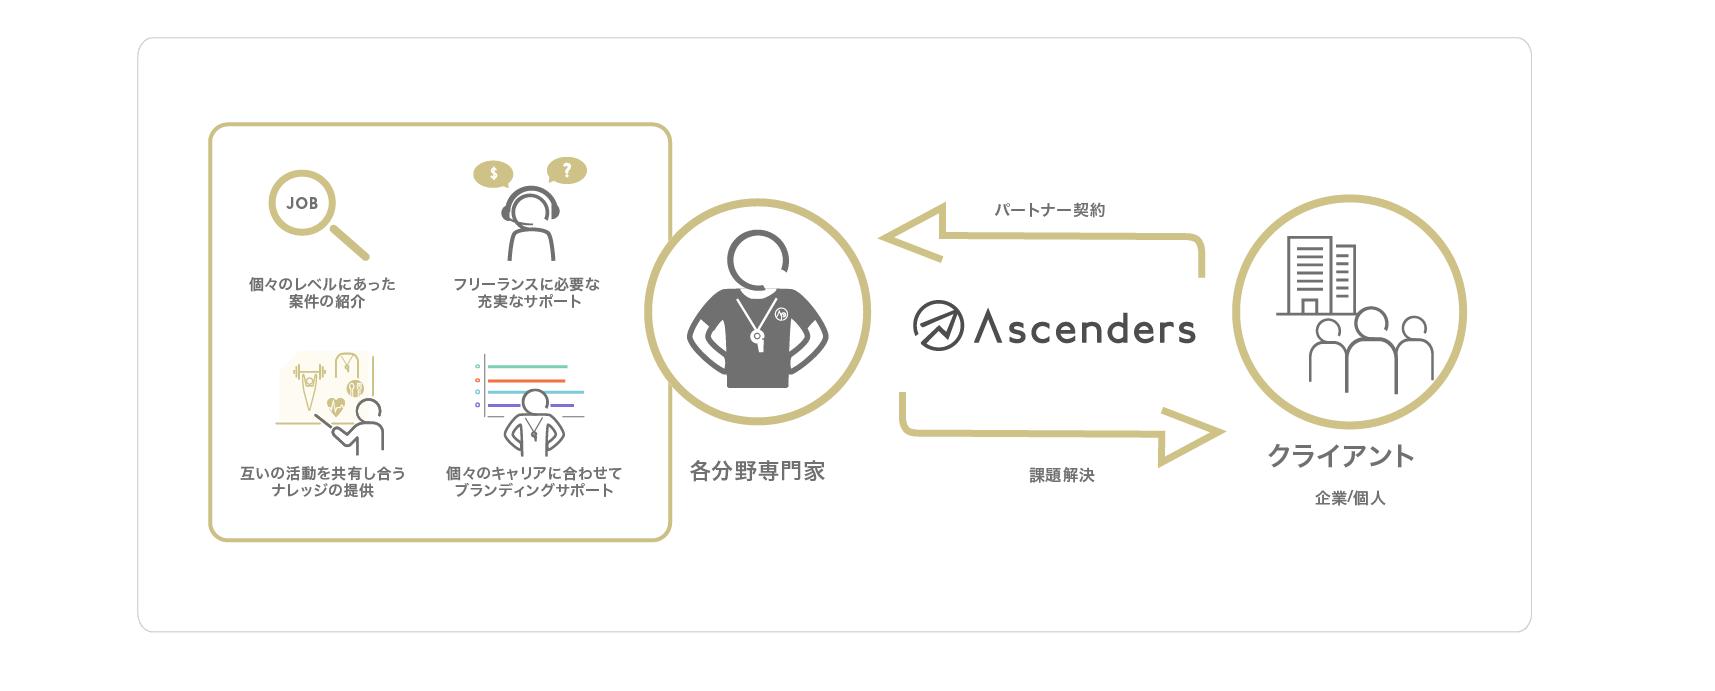 Ascenders Player Partners説明図